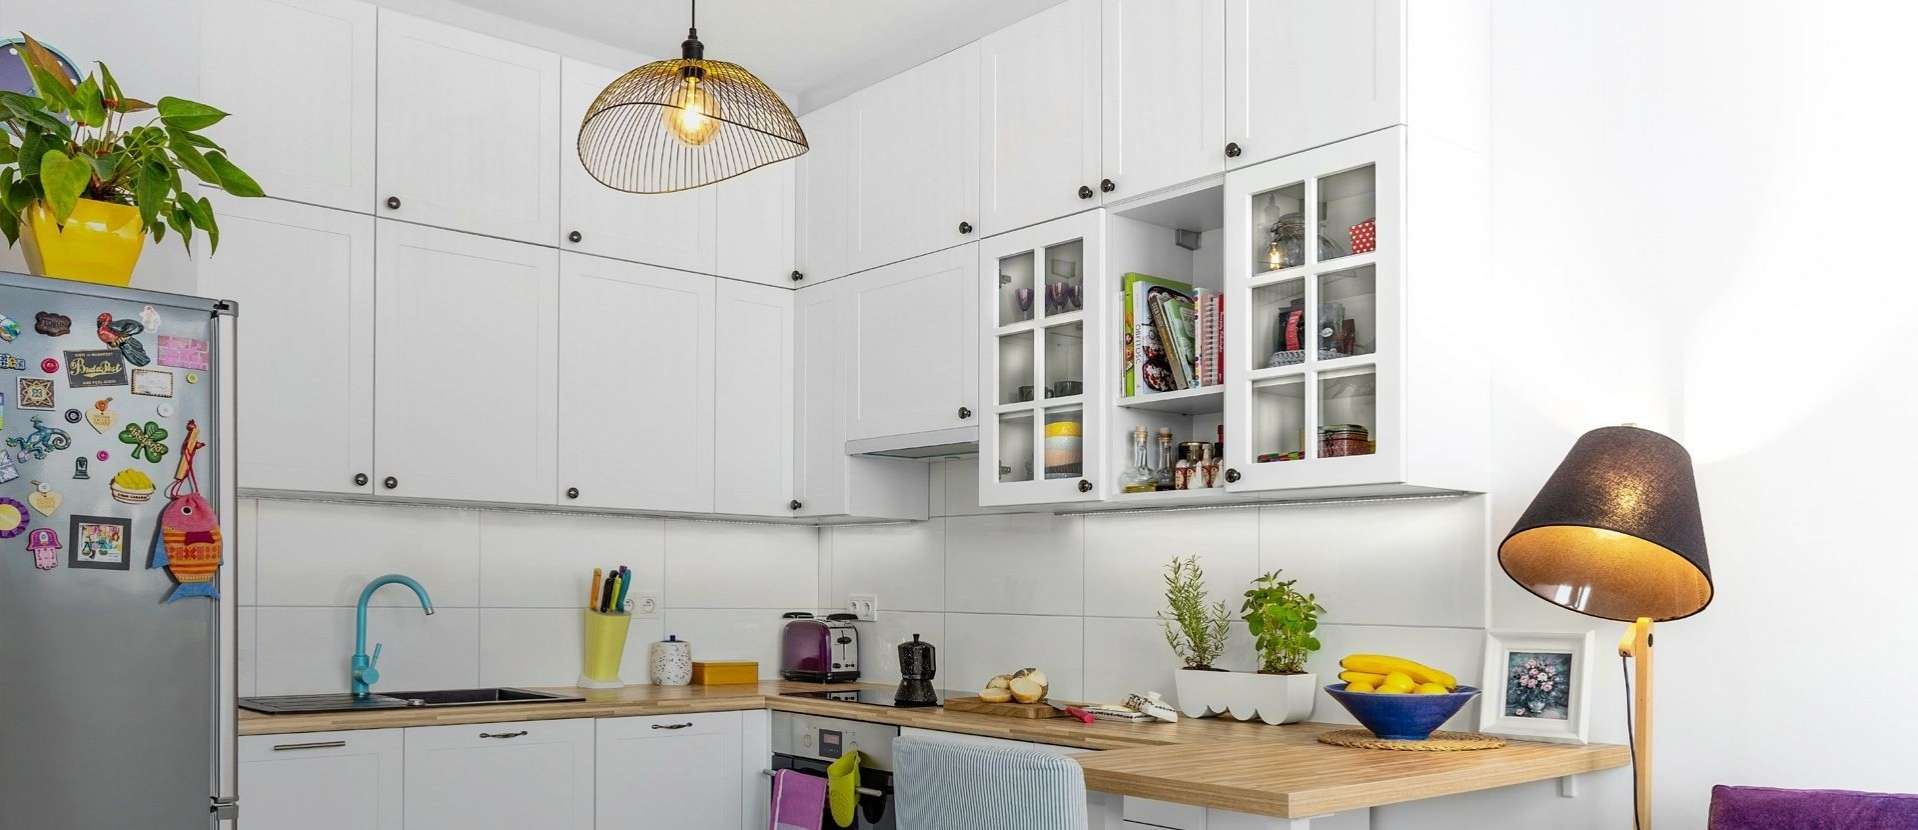 На светлой  стороне кухни